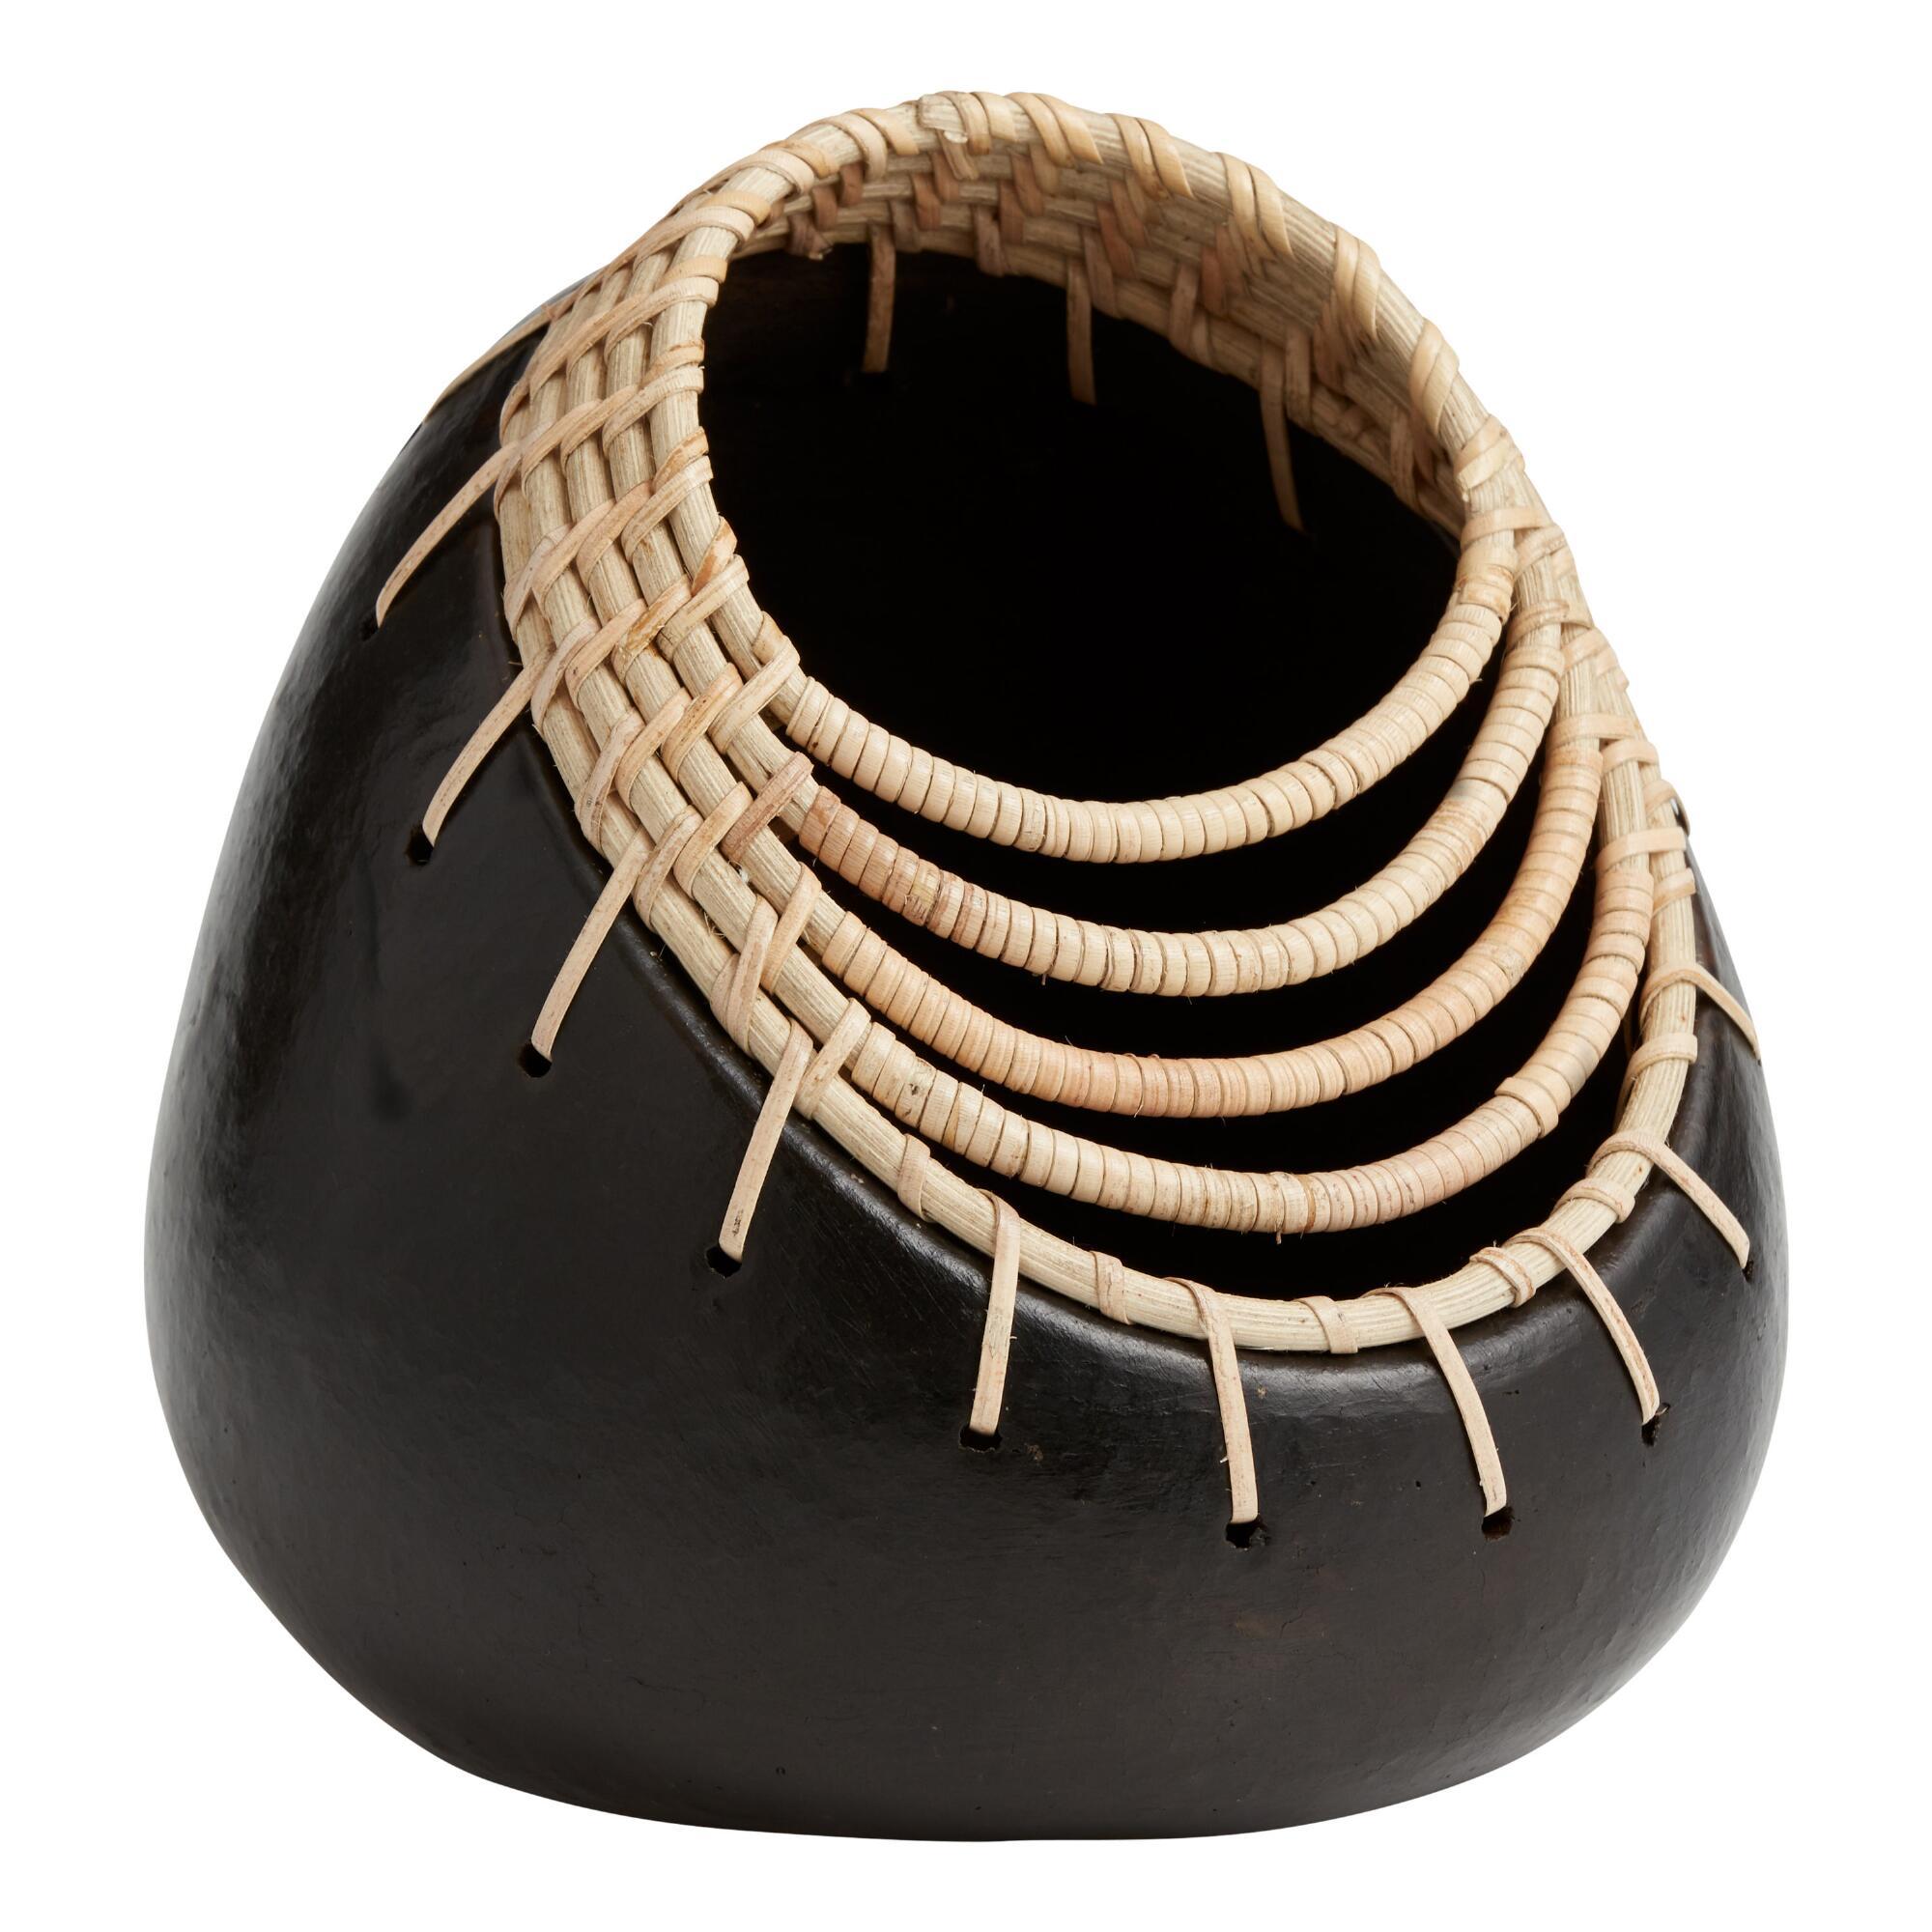 Round Black Terracotta And Rattan Vase $24.99